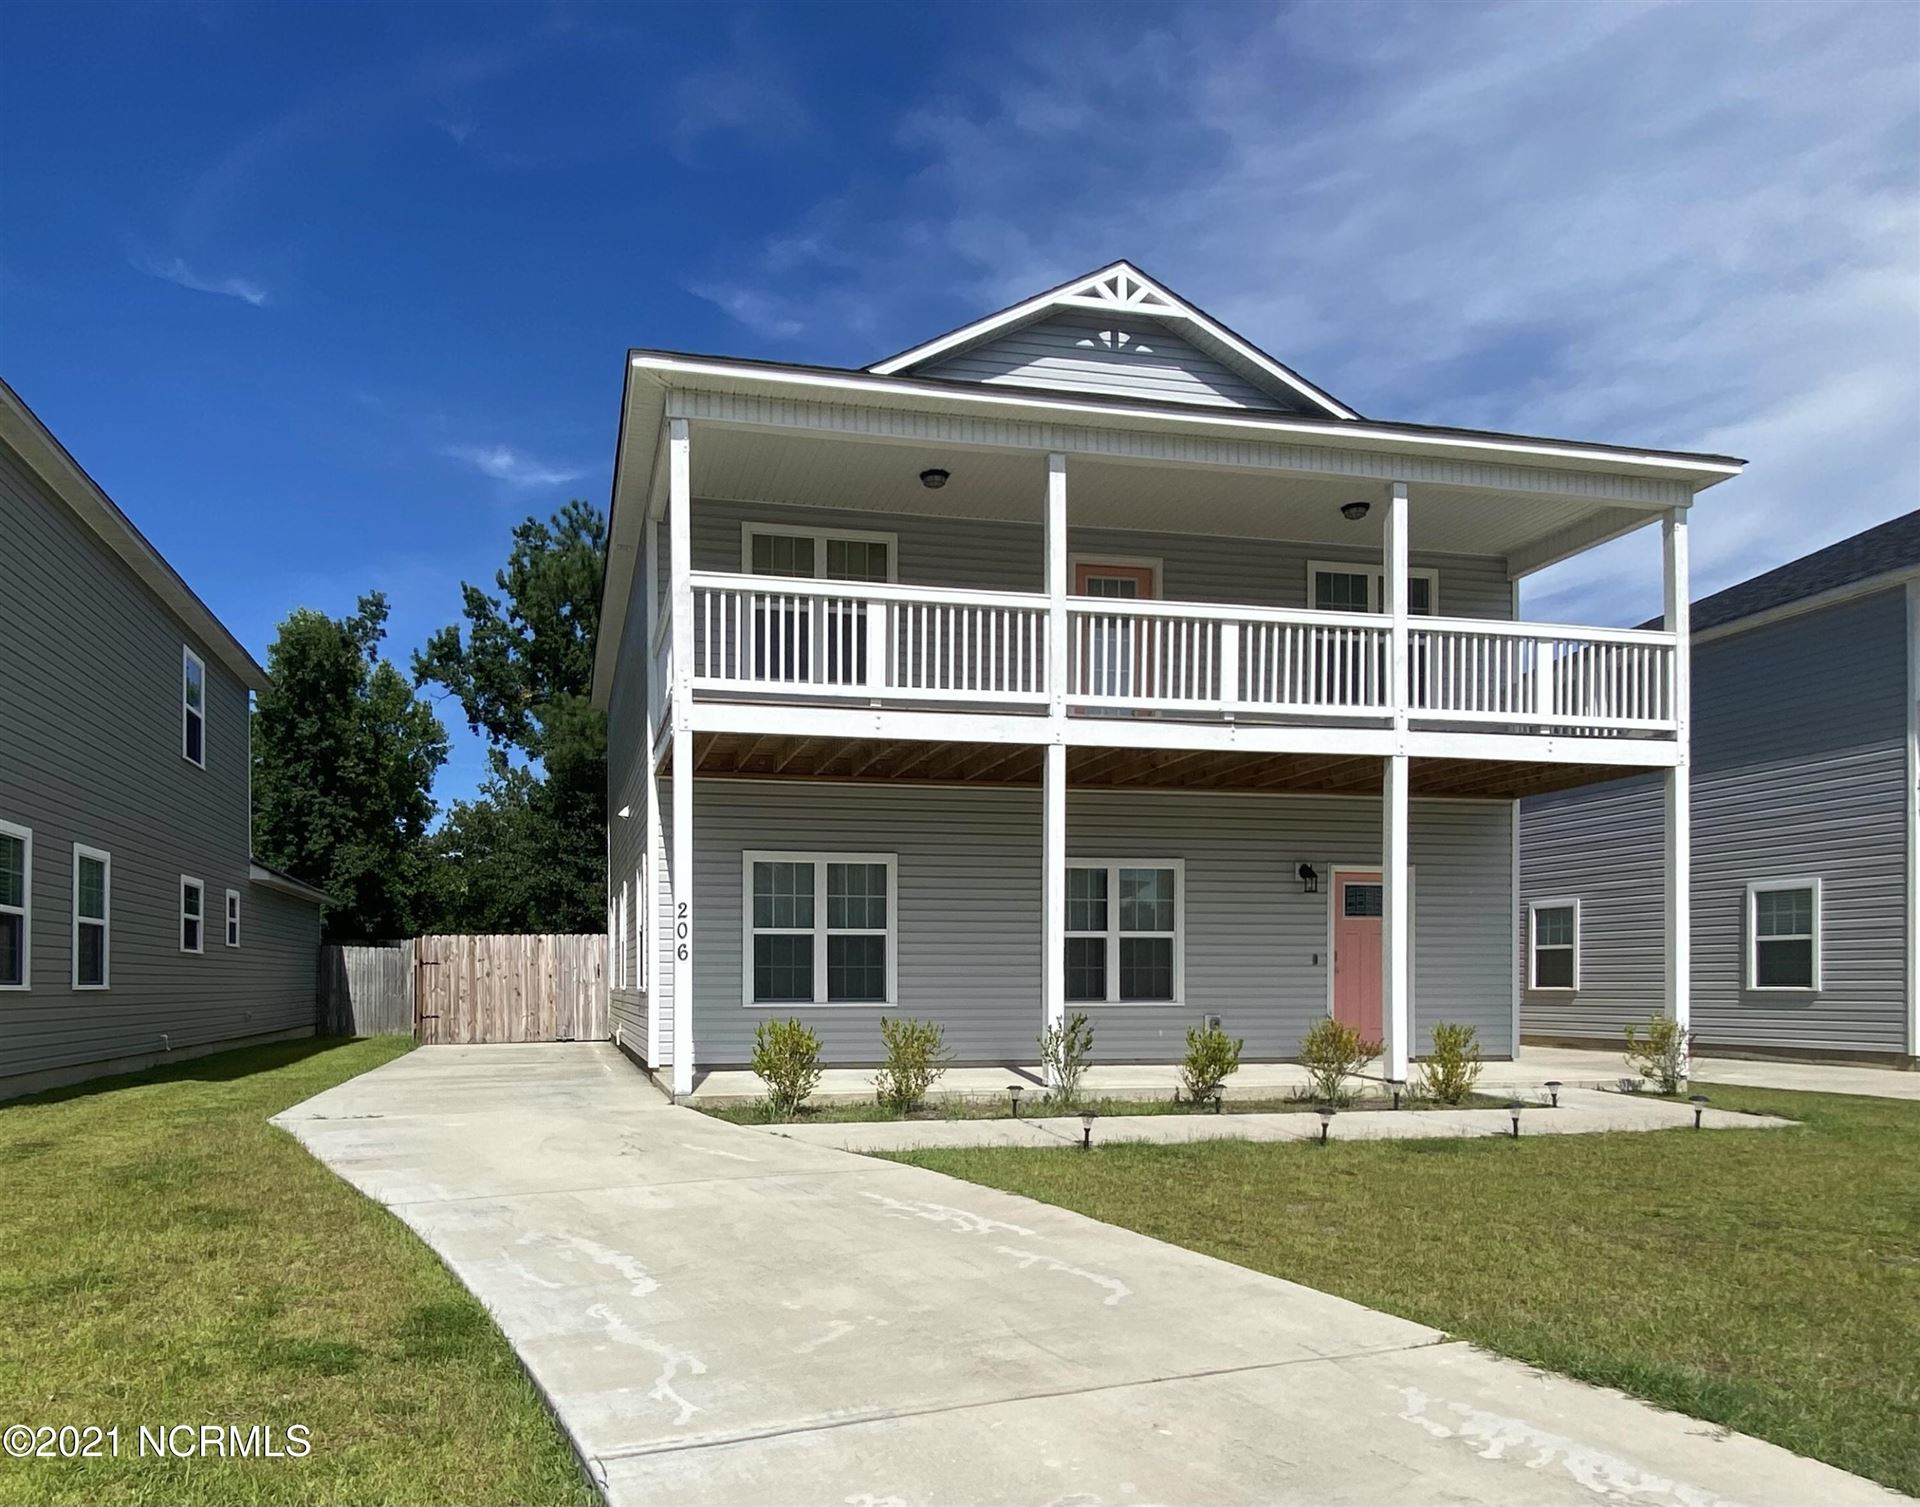 Photo of 206 Robert Alan Drive, Jacksonville, NC 28546 (MLS # 100287187)